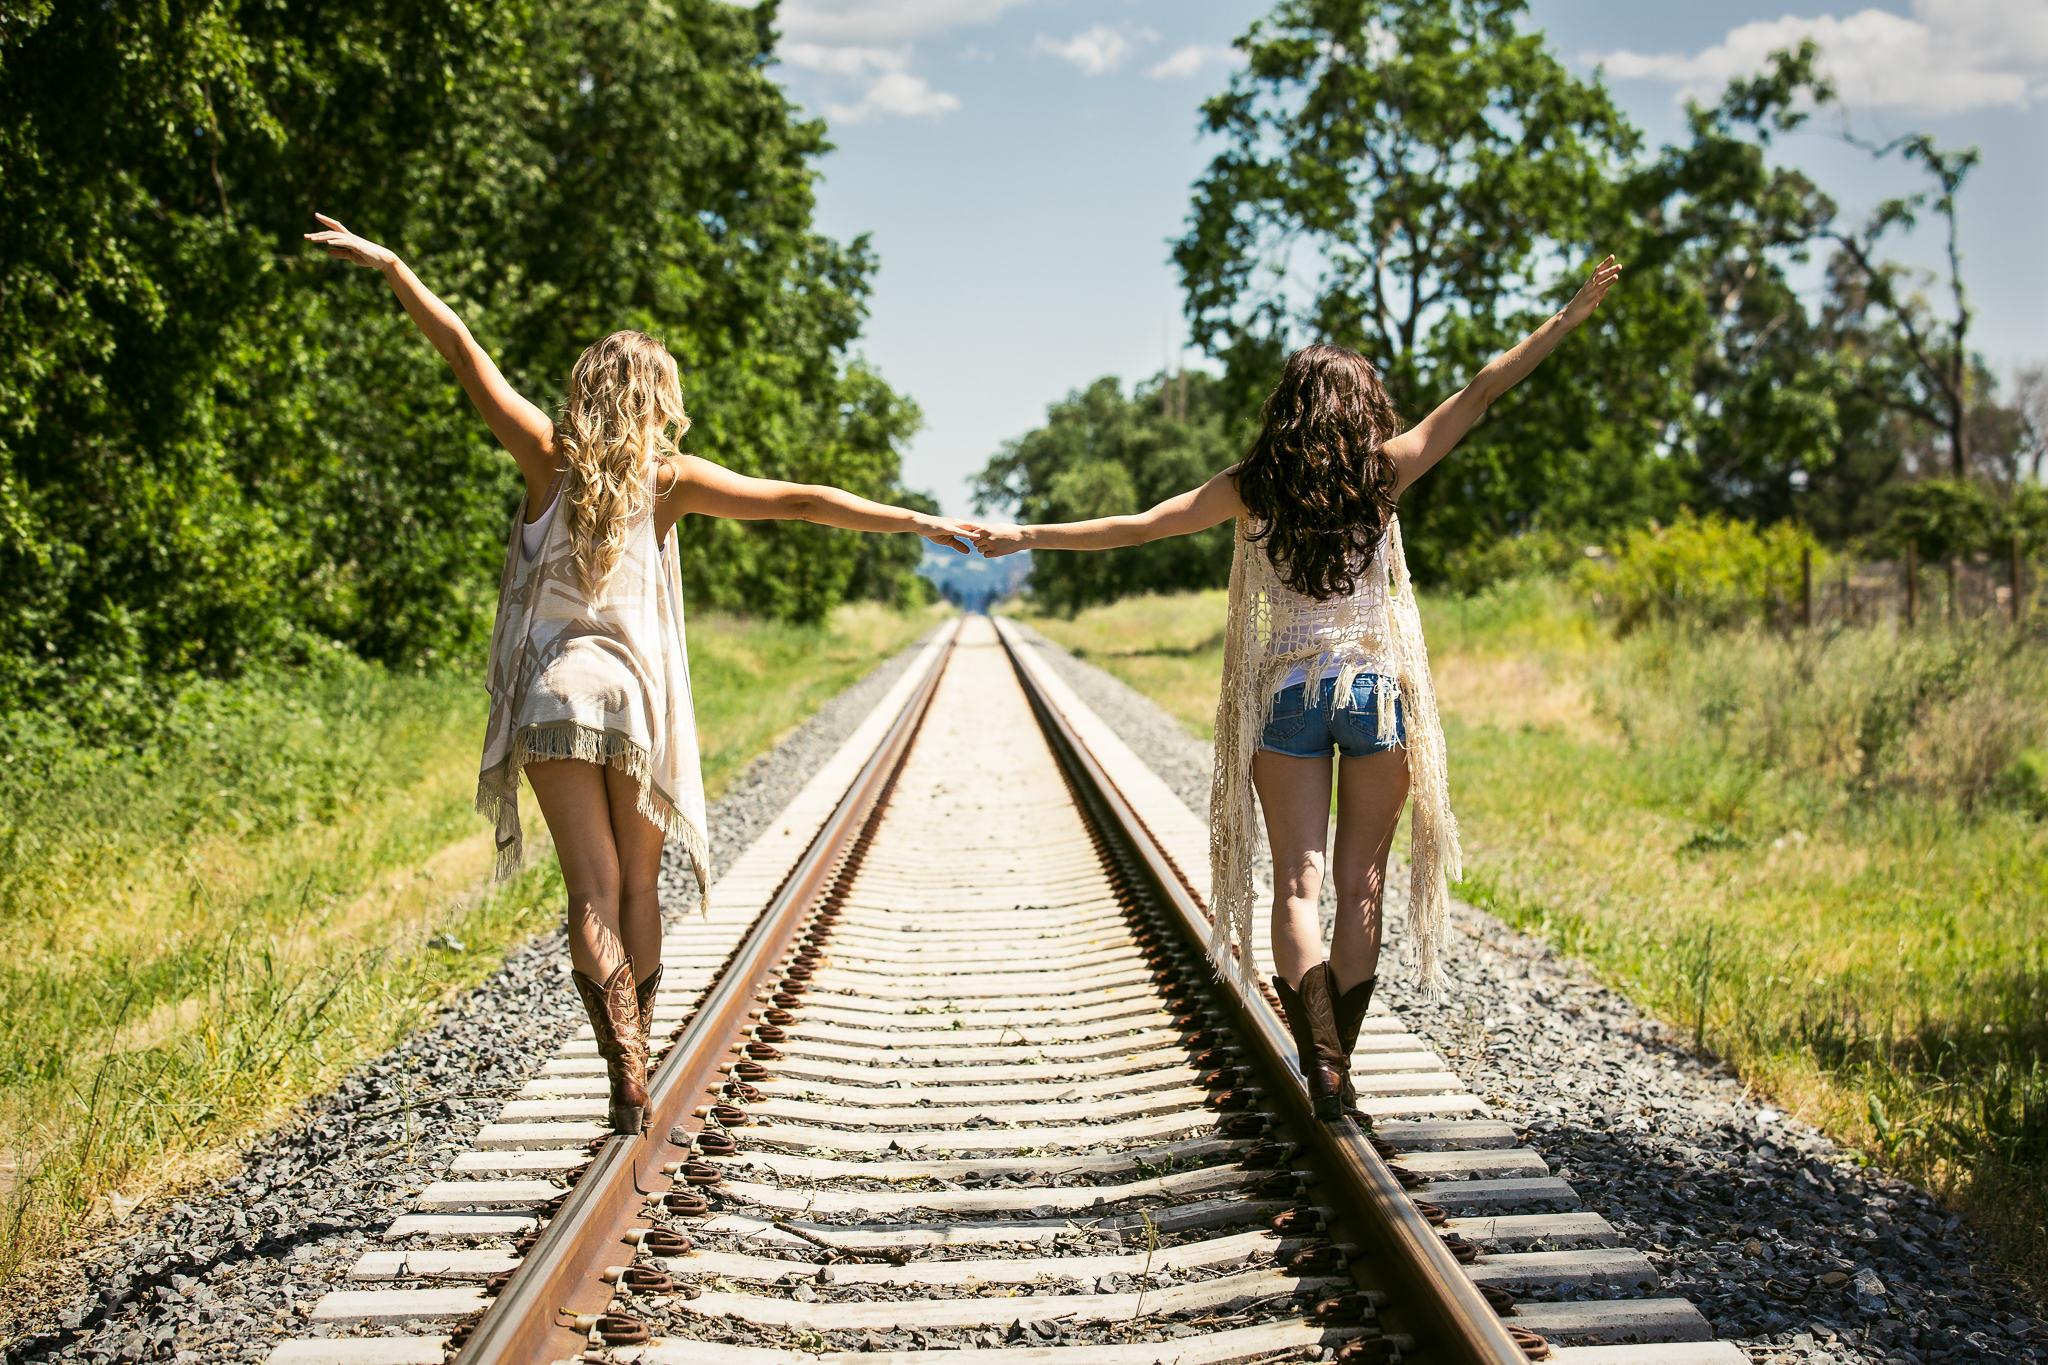 20160501 Carol and Fannie - Santa Rosa-6070-Edit-3.jpg